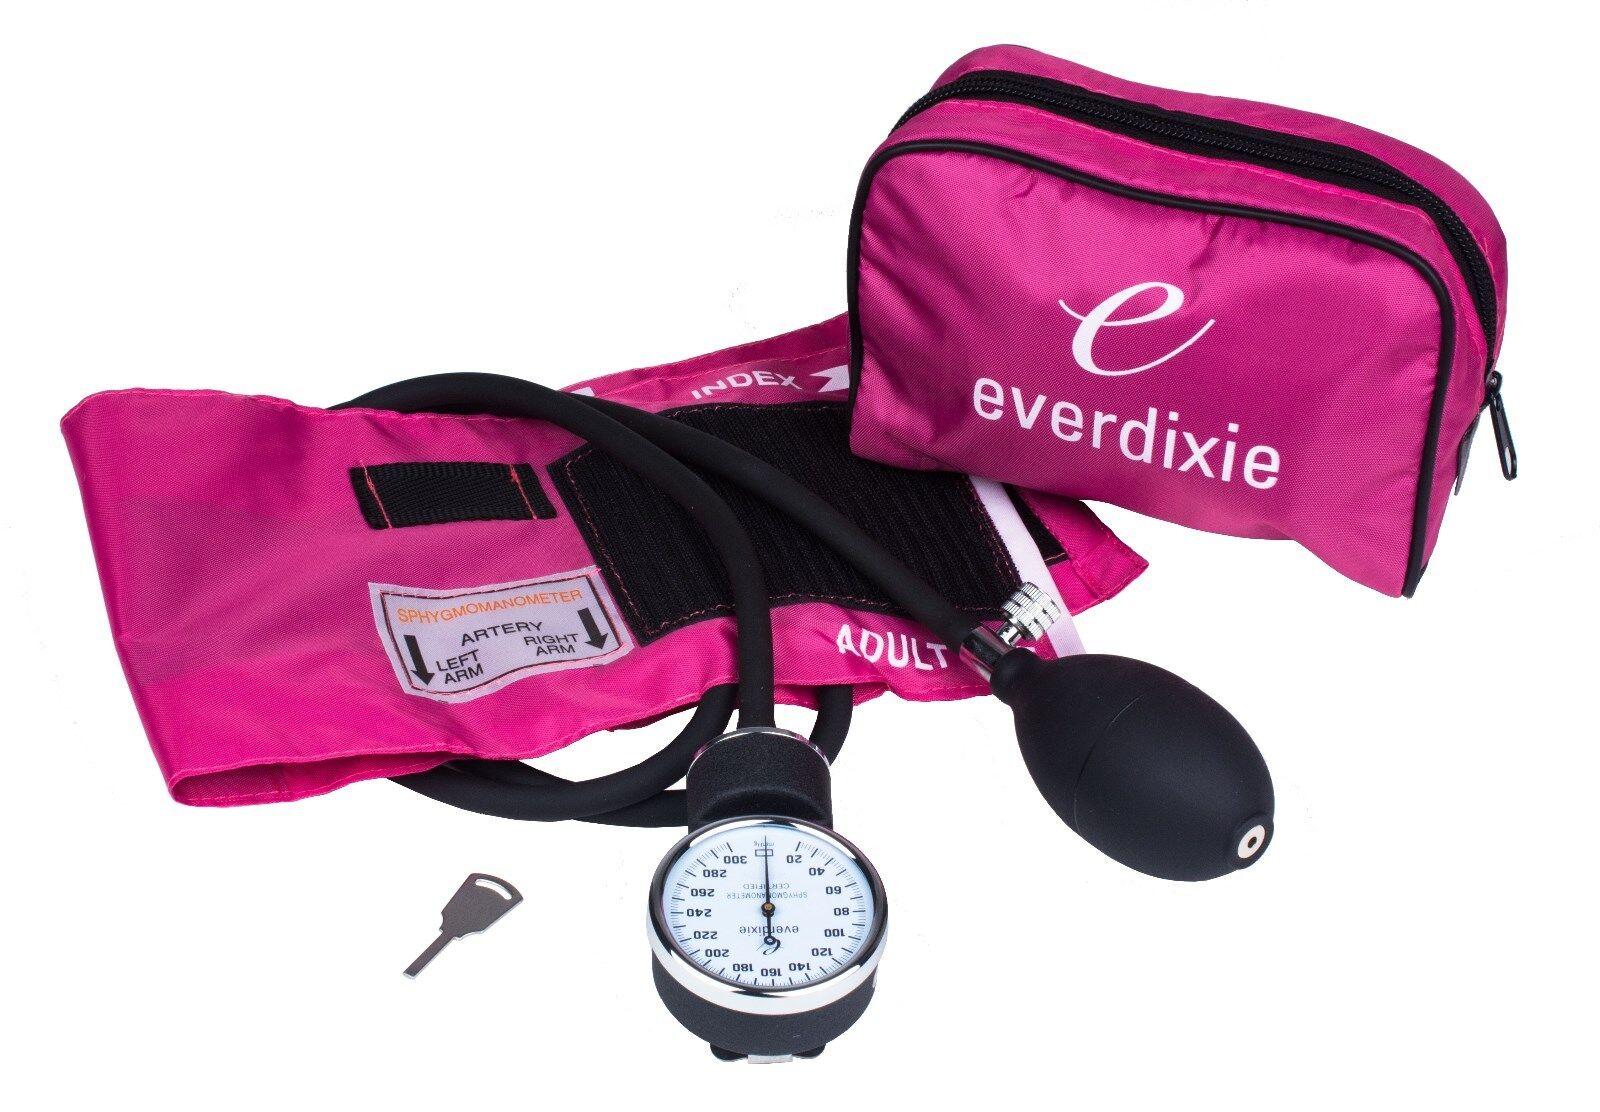 new pink adult bp cuff blood pressure